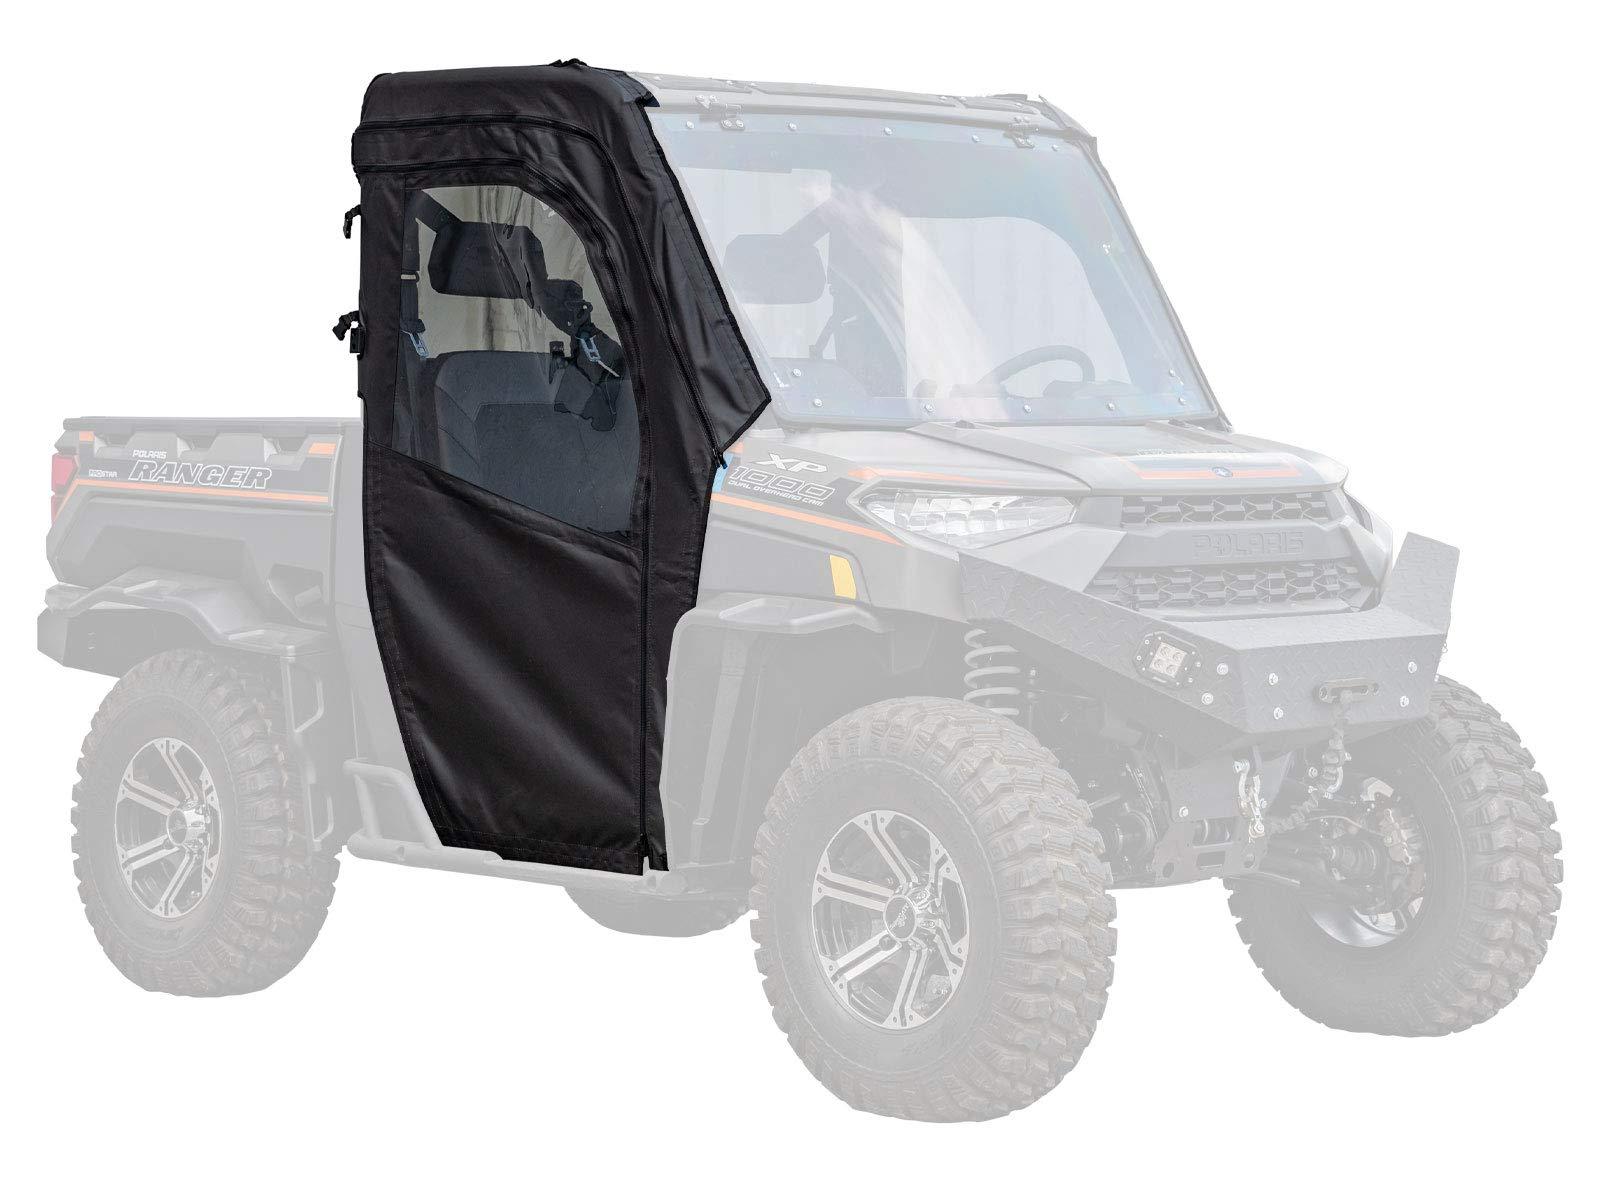 SuperATV Soft Cab Doors for Polaris Ranger XP 900 (2013+) - Pair of Front Doors